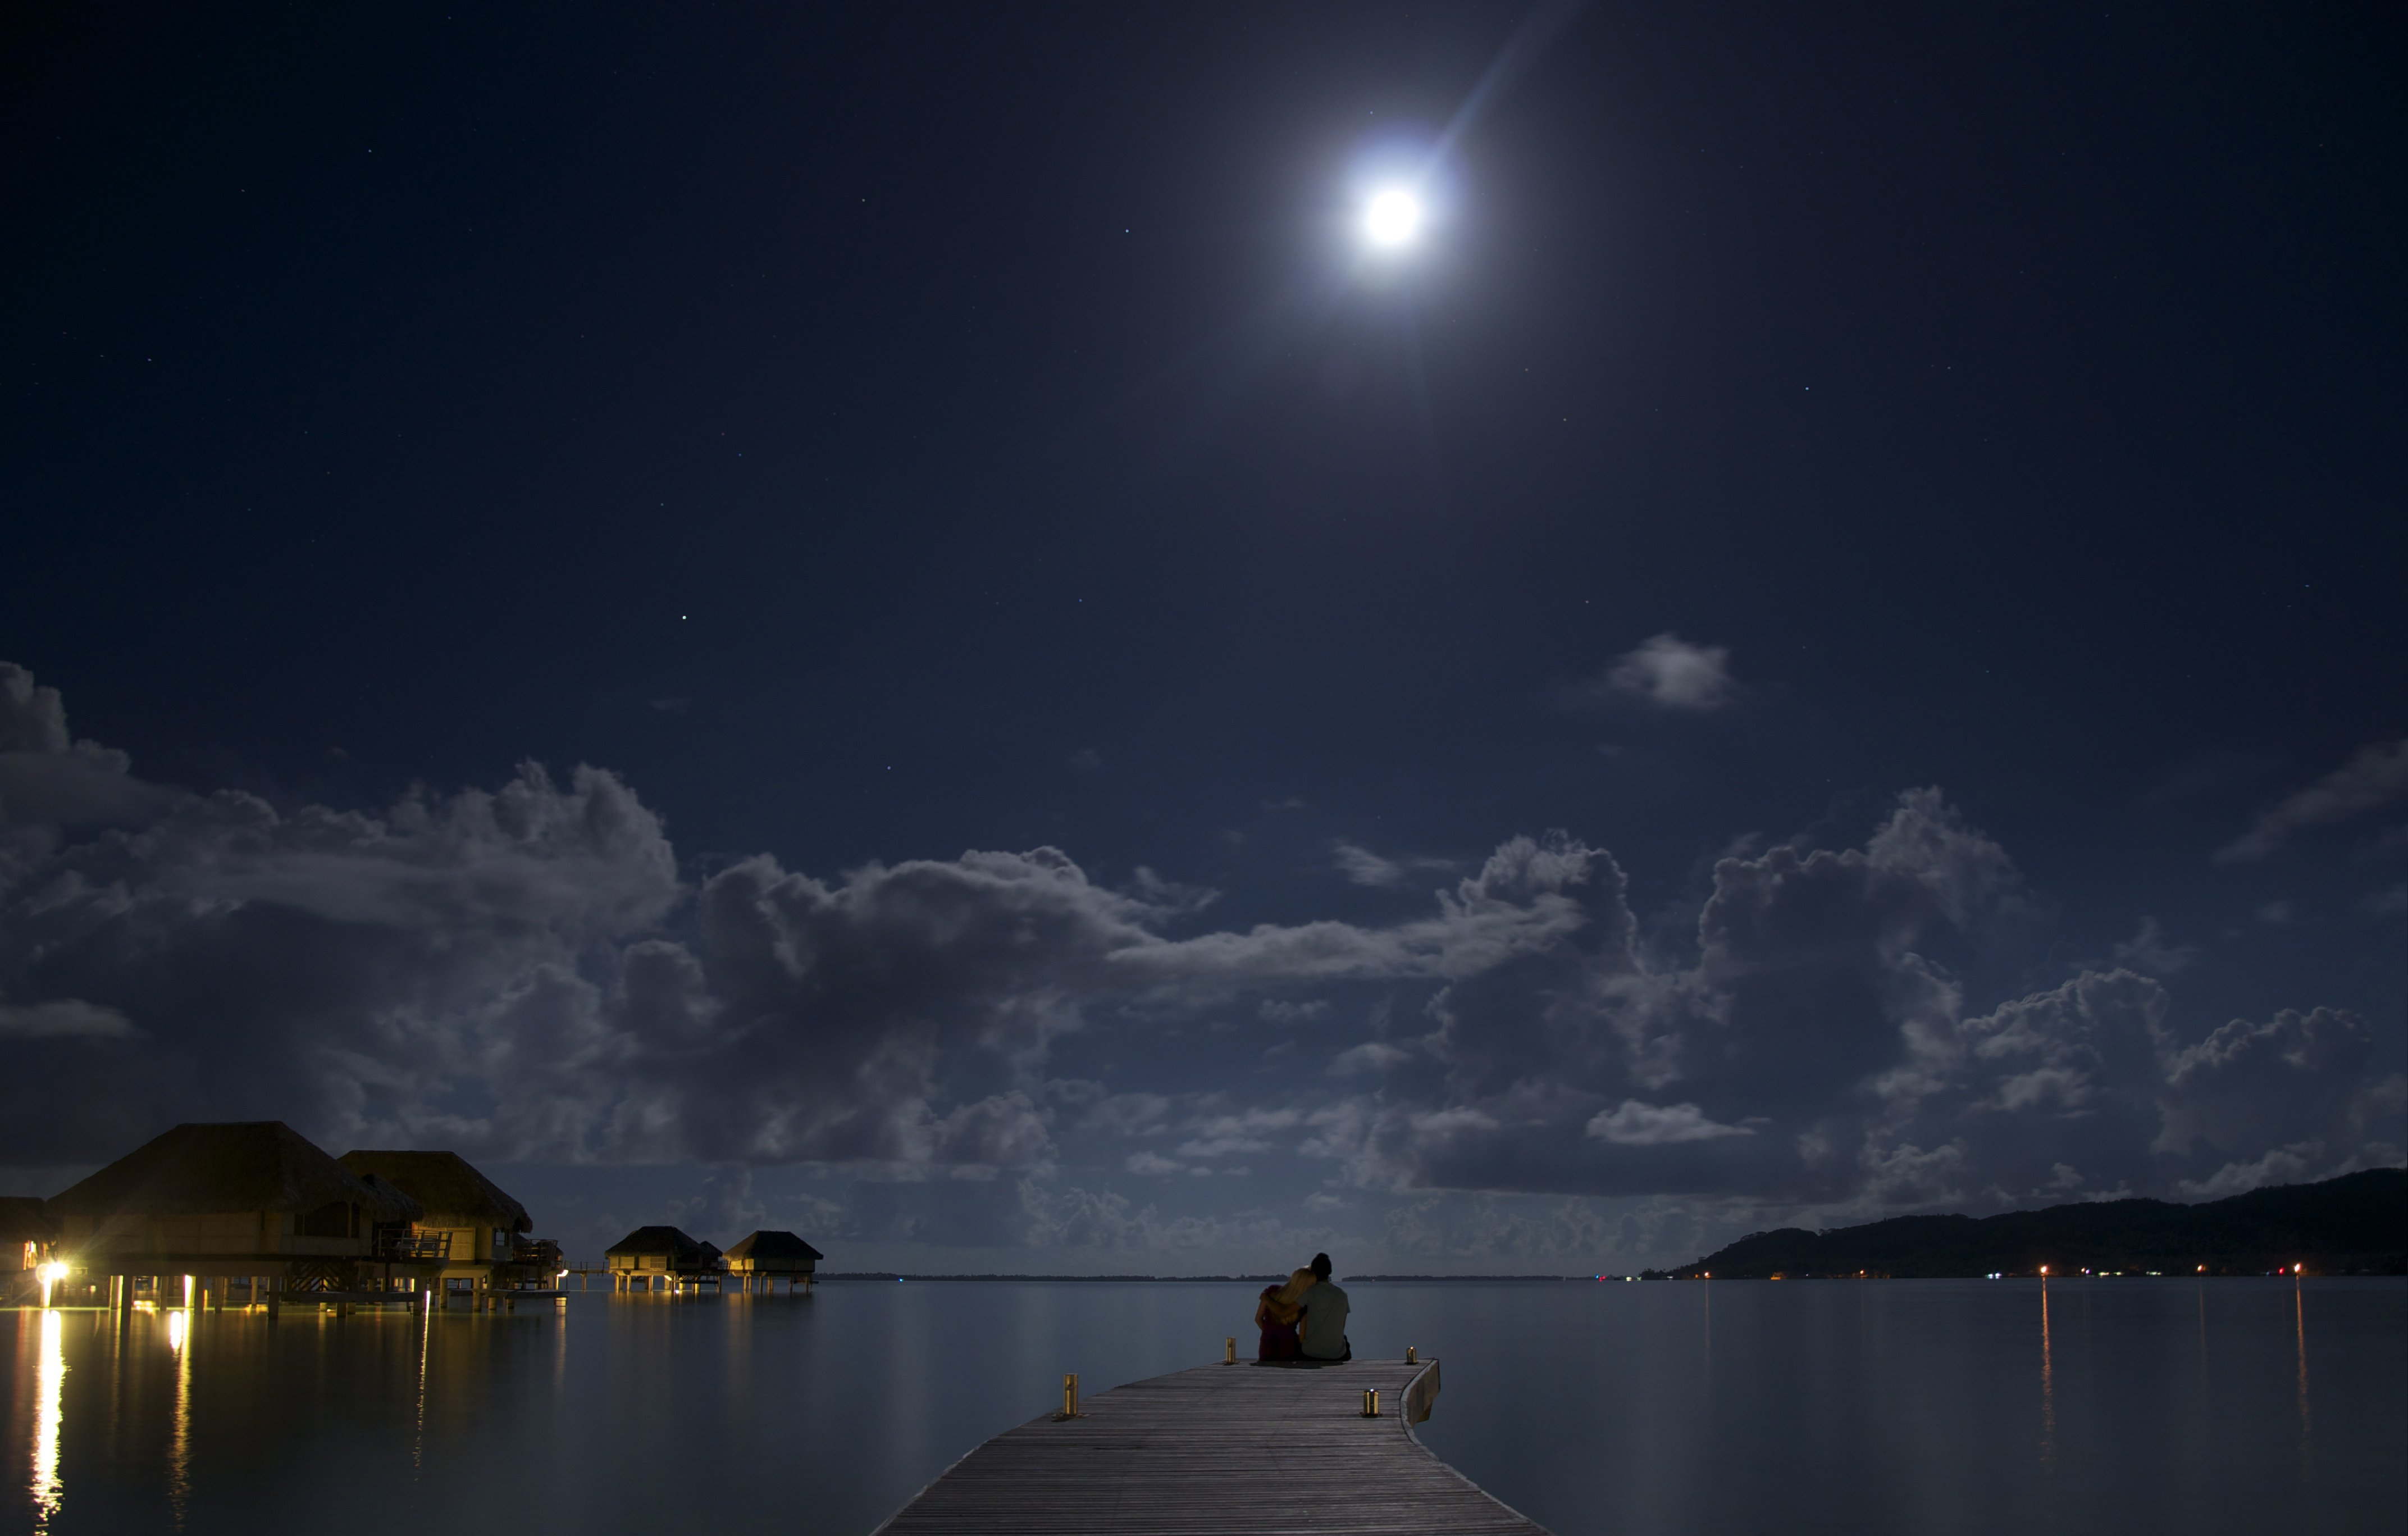 Night Moon Romance Love Stars Sky Clouds Wallpaper: Night Moon Ocean Two Romance Mood Love Wallpaper